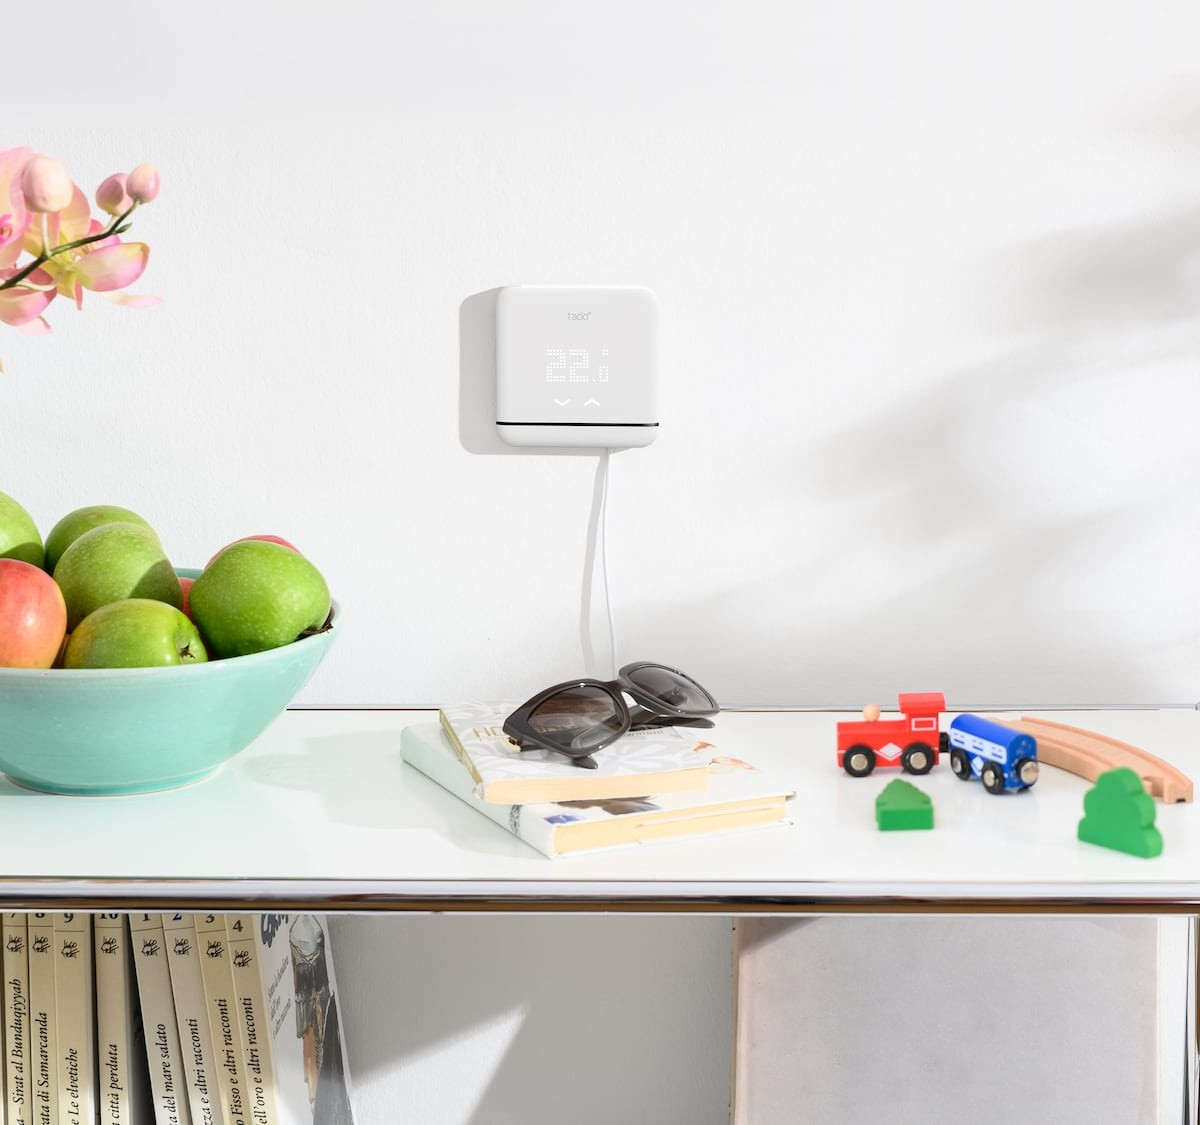 tadoº Smart AC Control V3+ infrared remote keeps you comfortable while saving energy